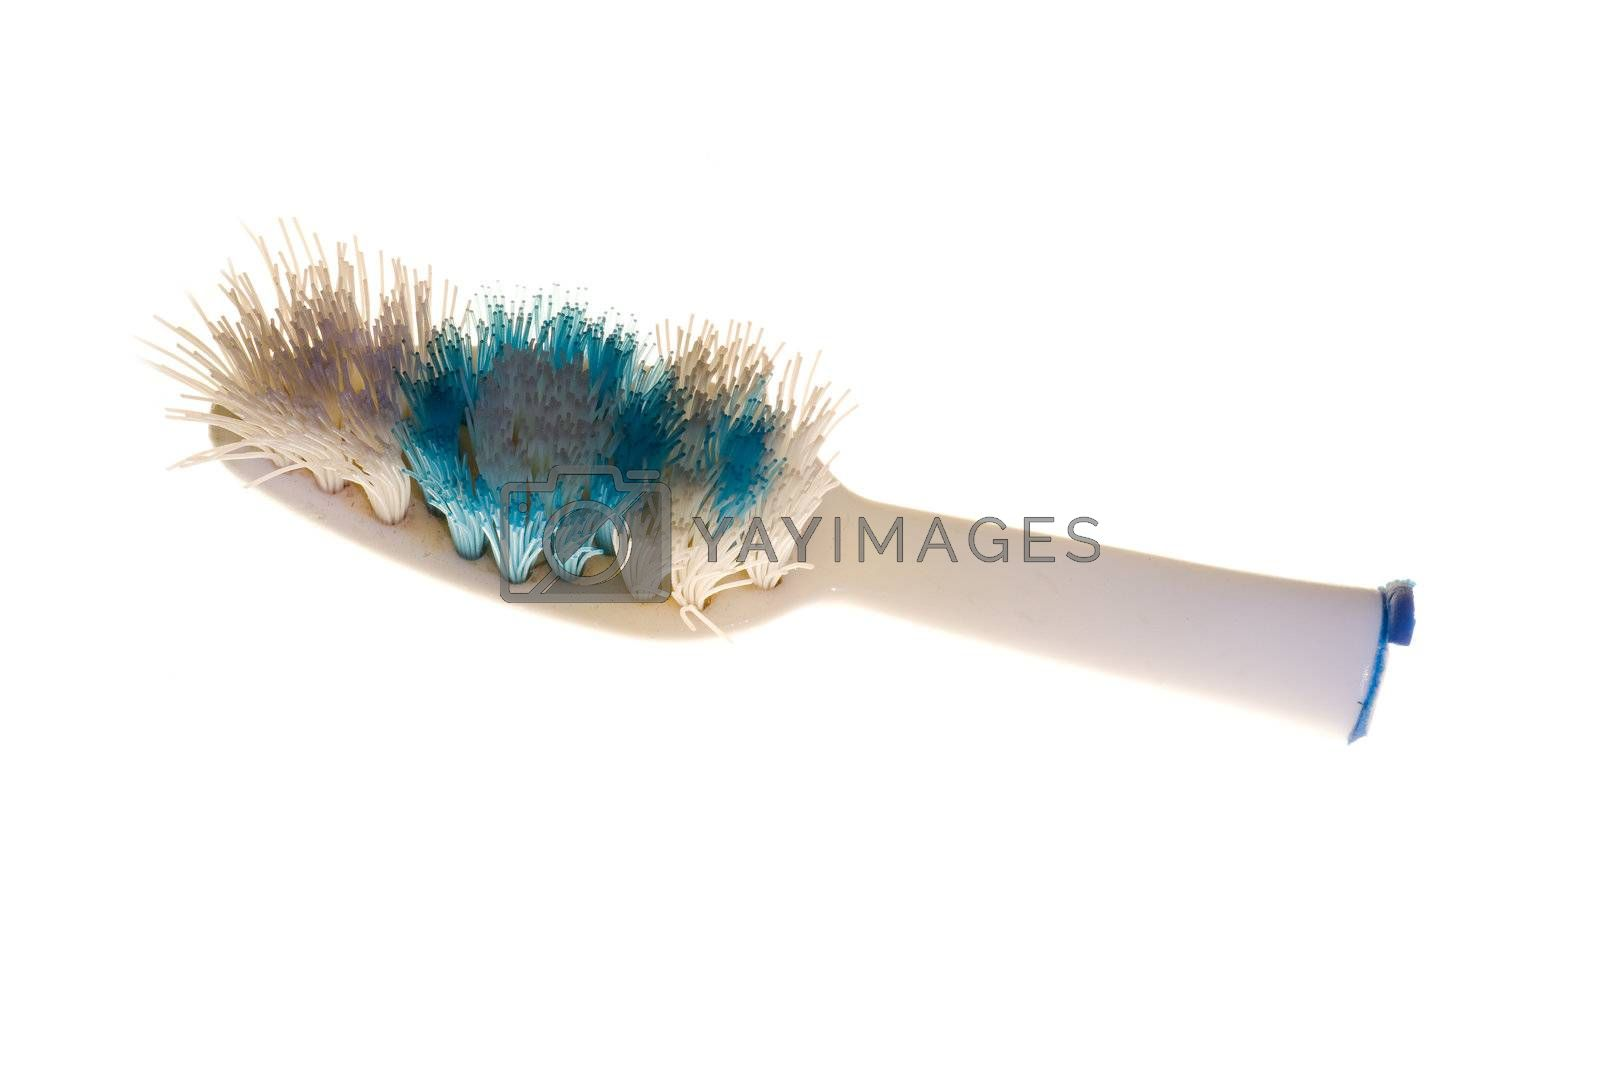 Royalty free image of Broken toothbrush by elwynn